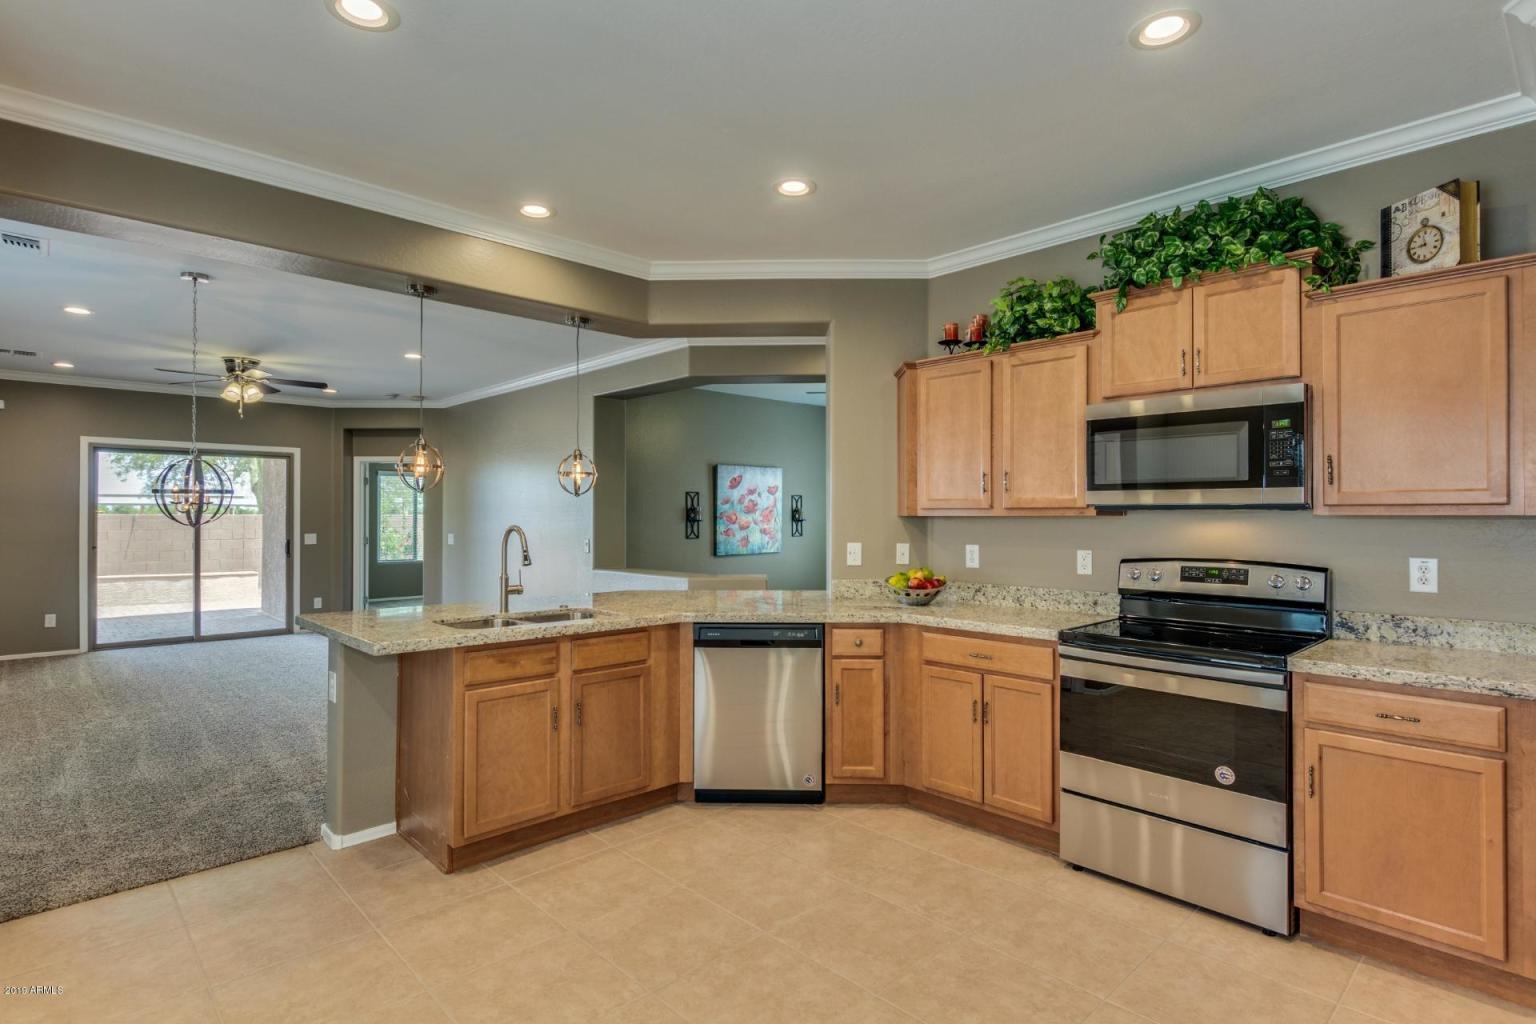 homes sold queen creek family drew team